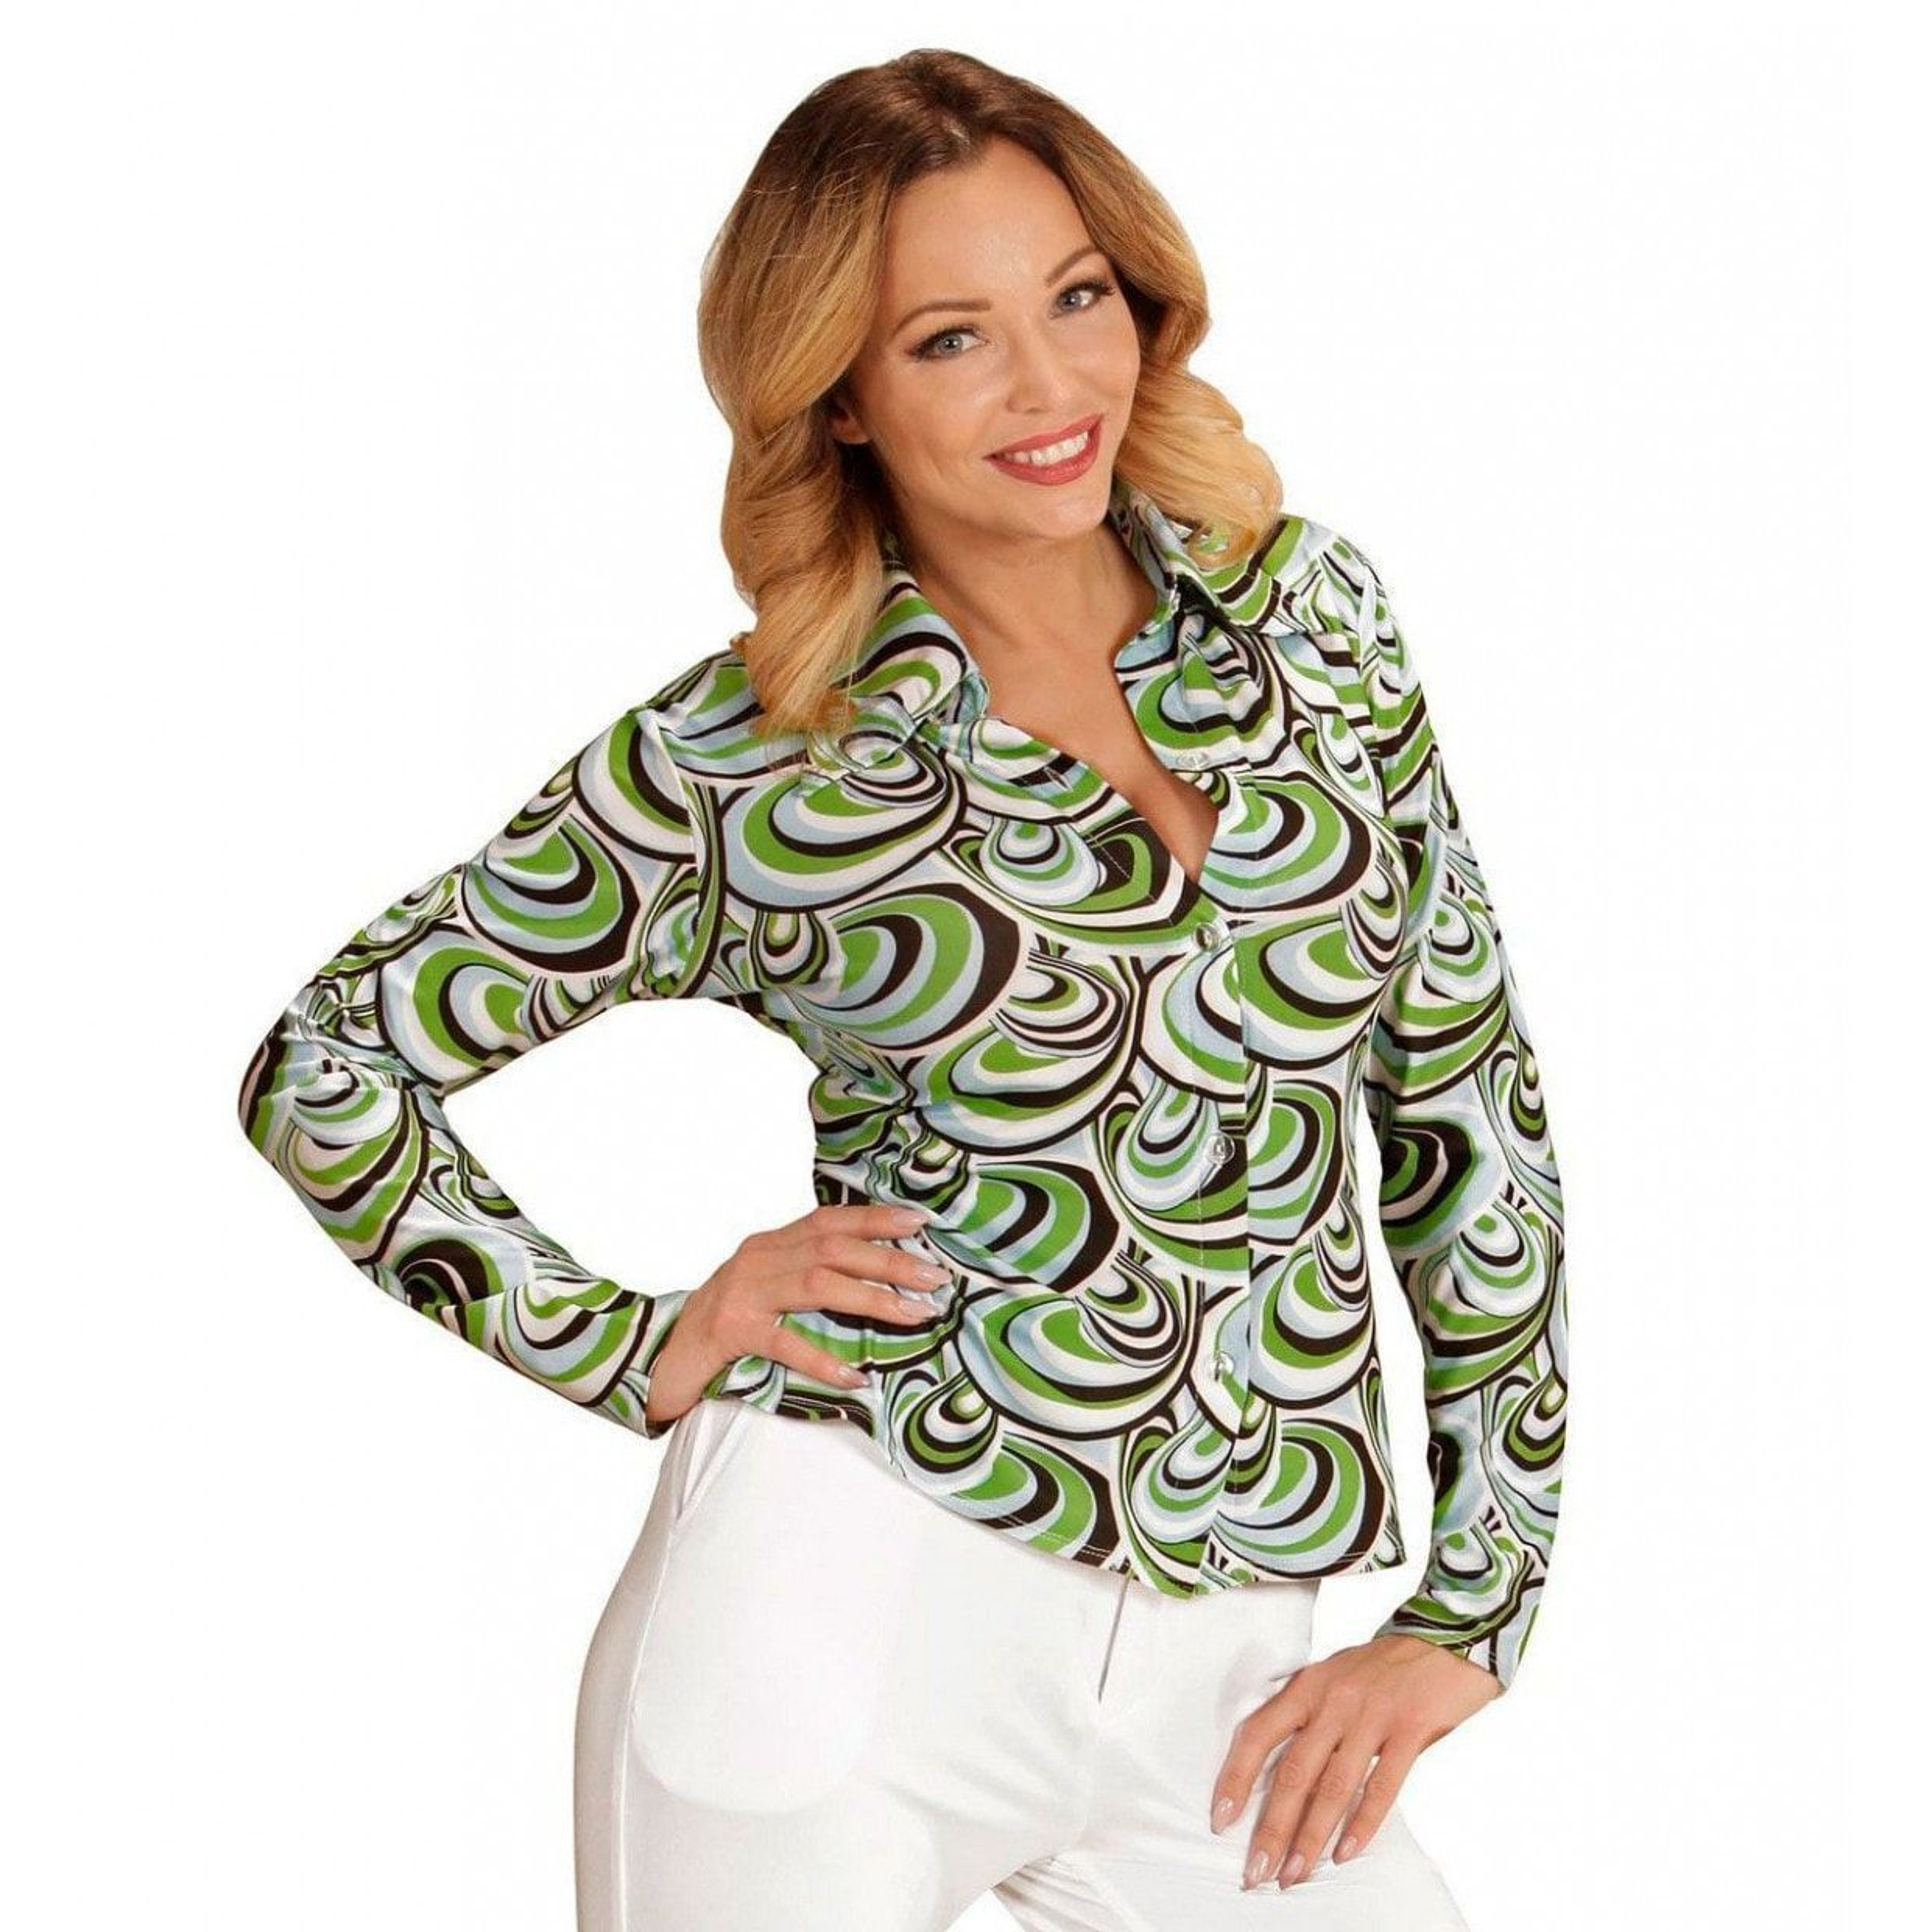 b413171c147 70's en 80's groovy disco blouse retro printje shirt dames groene golven